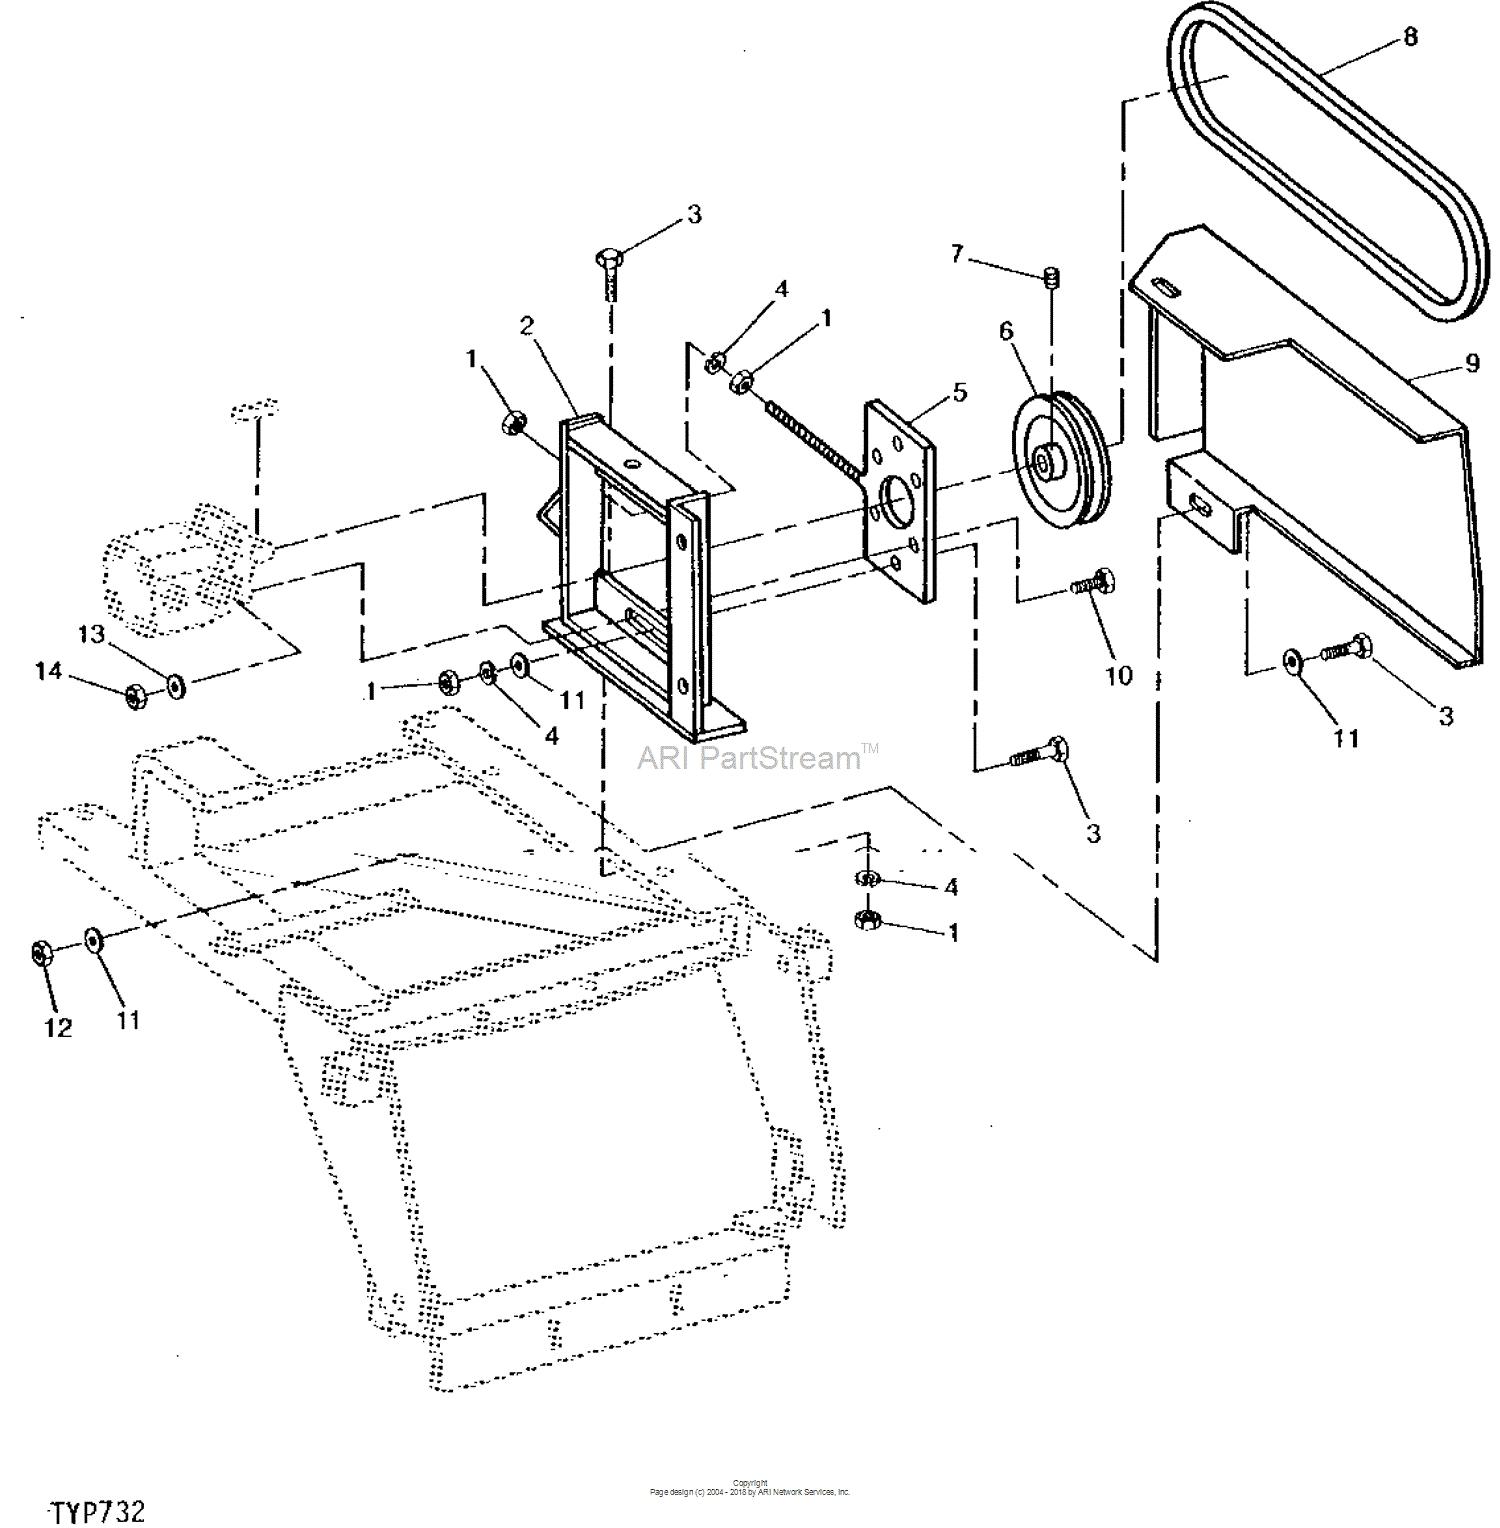 hight resolution of john deere 757 wiring diagram john deere 2305 parts diagram awesome john deere log splitter